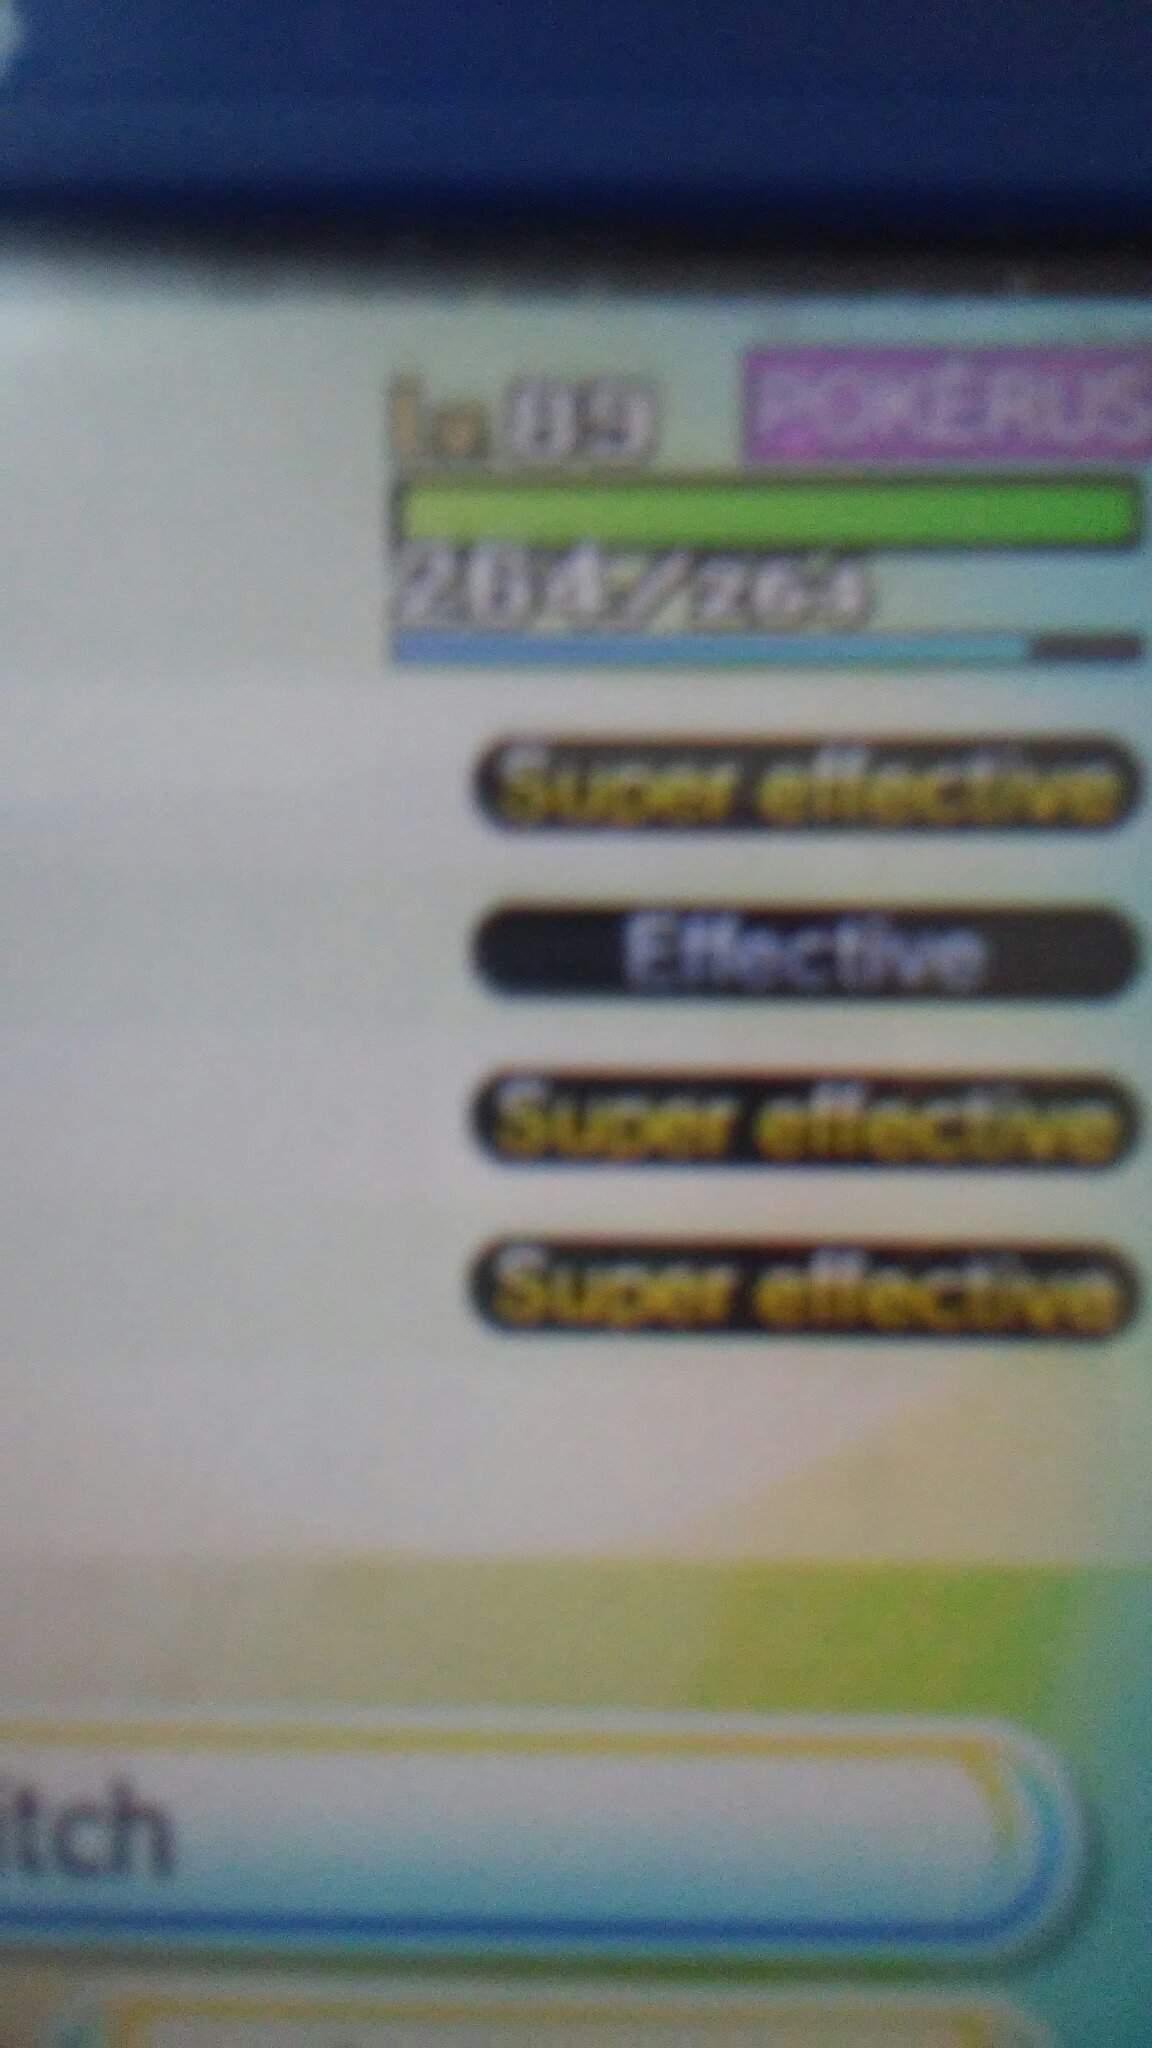 I just found out my metagross has pokerus   Pokémon Amino